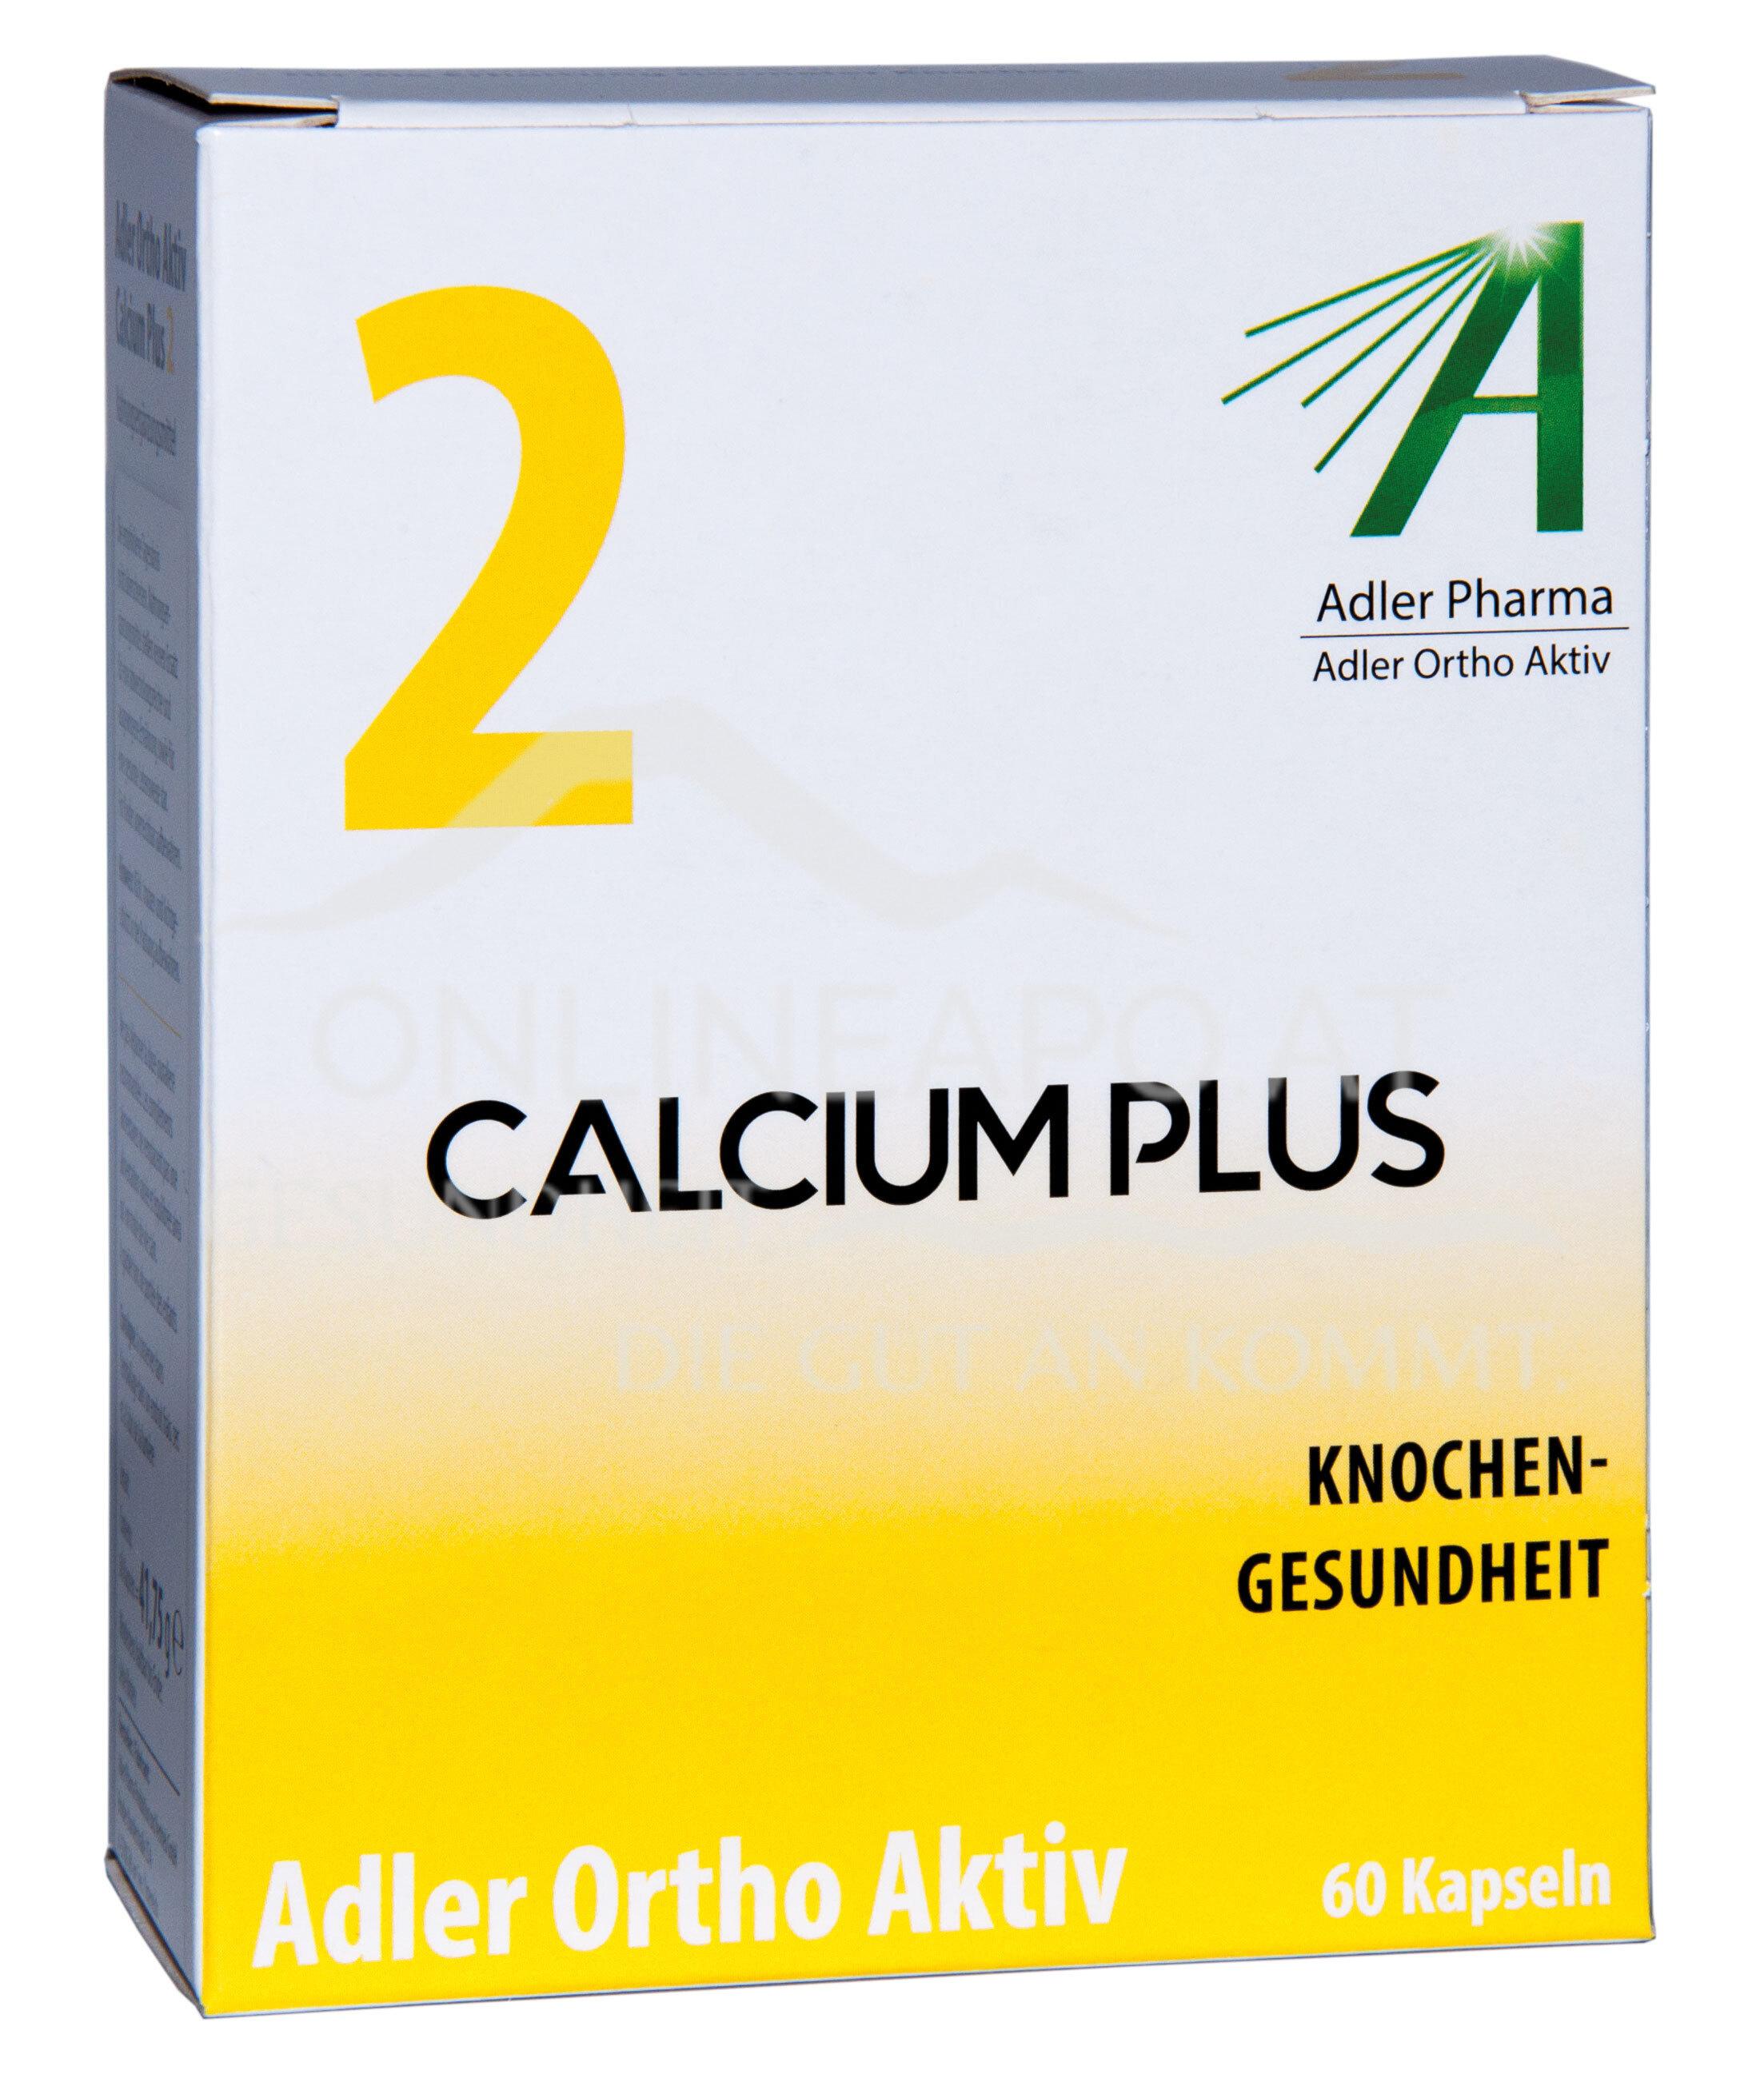 Adler Ortho Aktiv Nr. 2 Calcium Plus